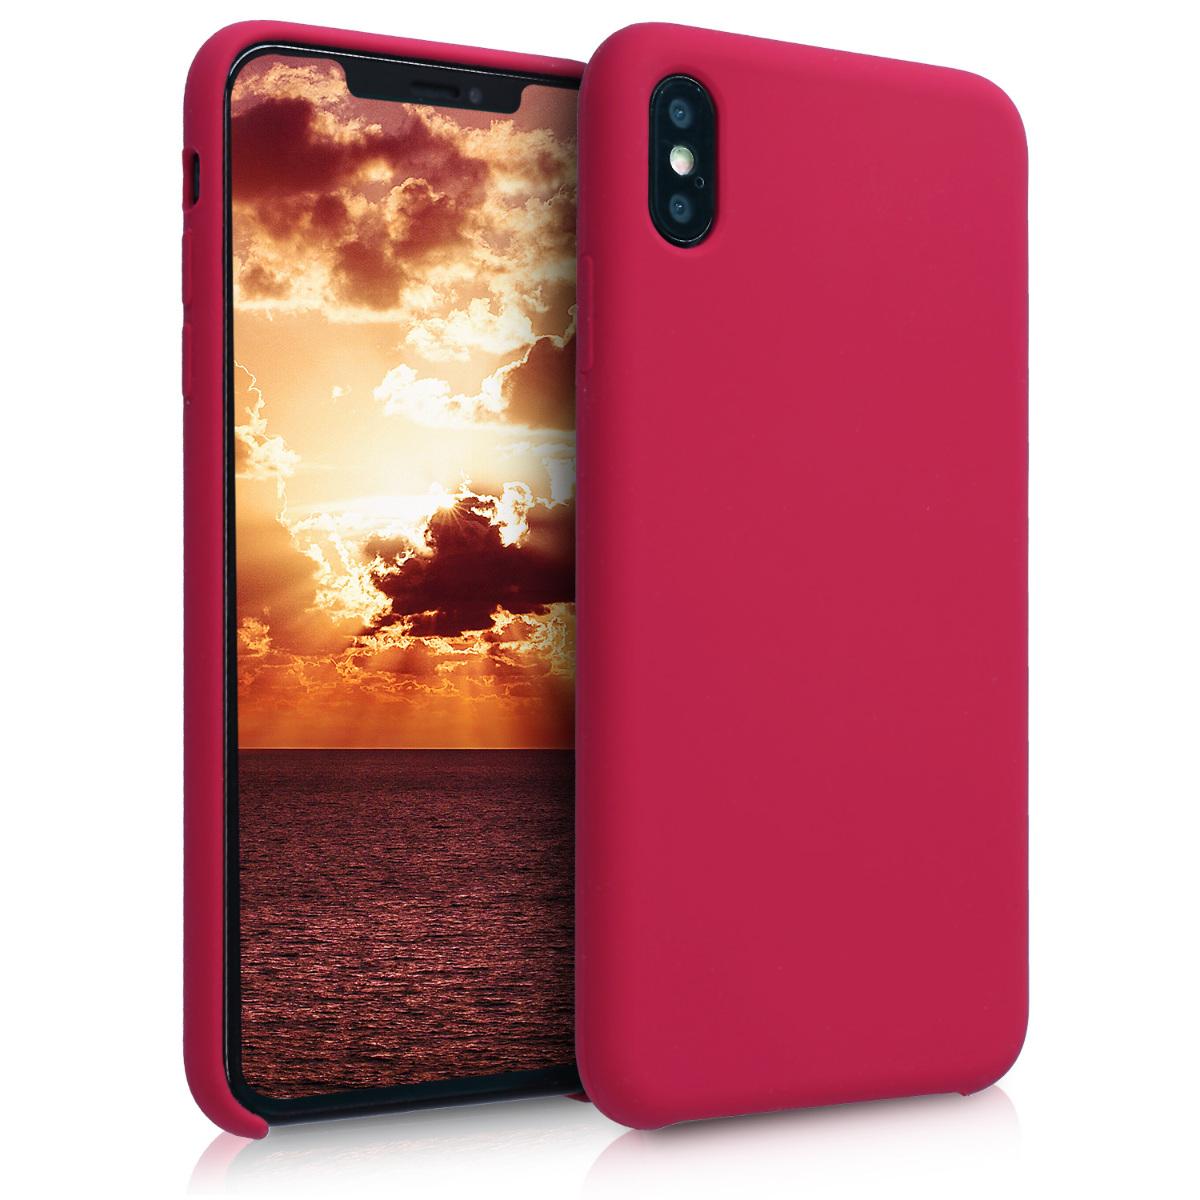 KW Soft Flexible Rubber Θήκη Σιλικόνης iPhone XS Max - Φούξια (45909.100)